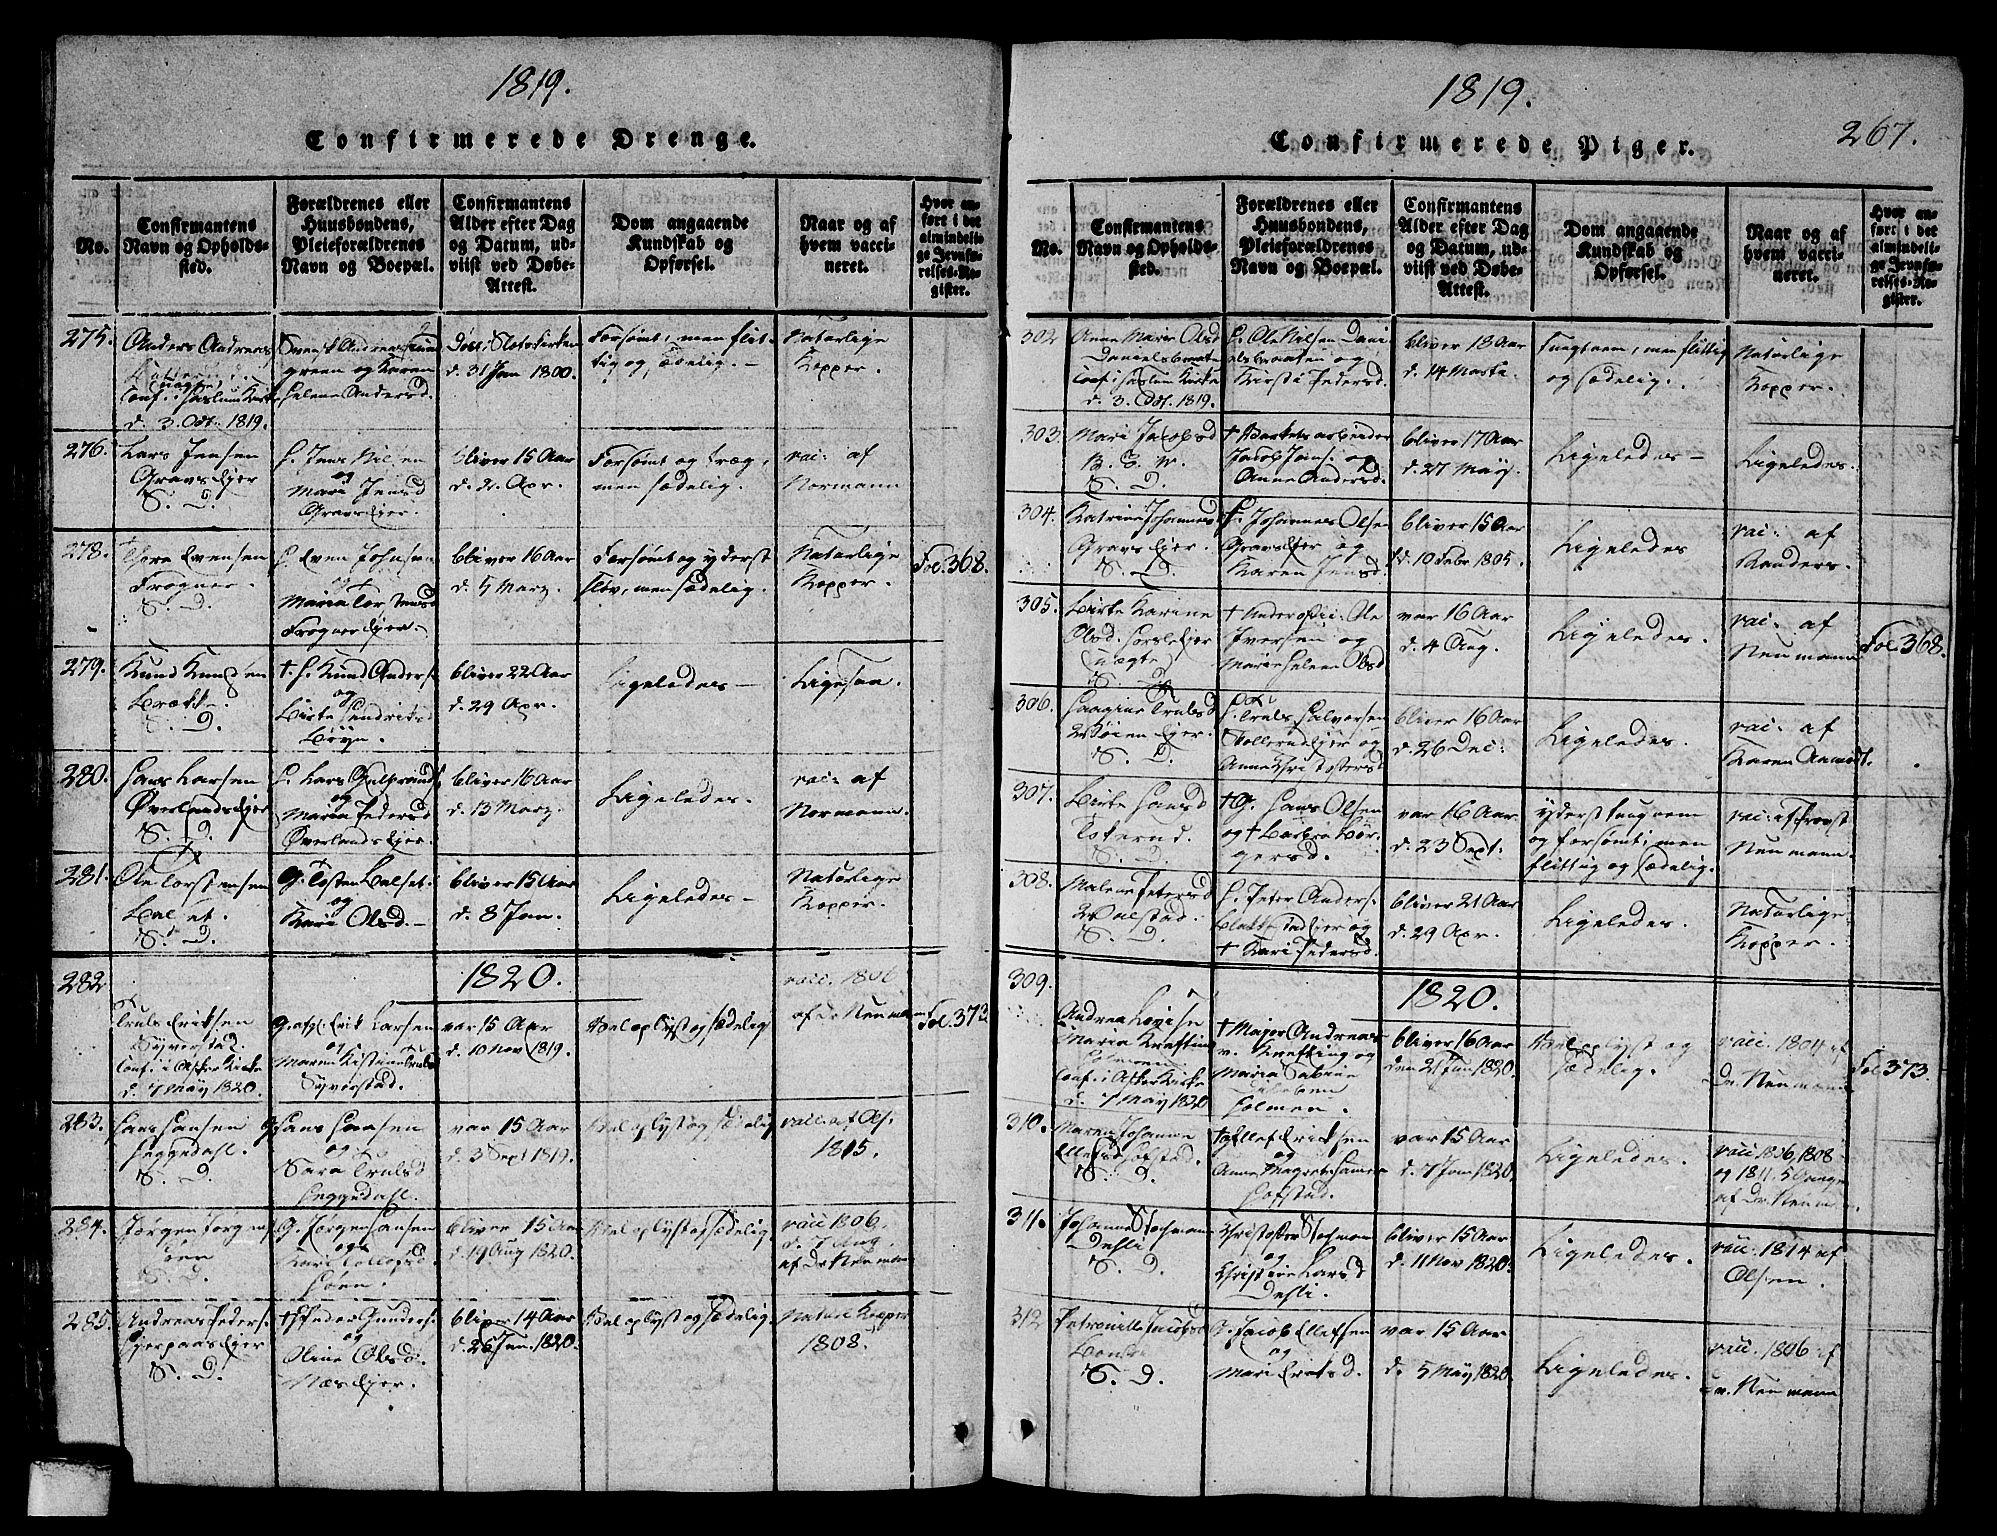 SAO, Asker prestekontor Kirkebøker, G/Ga/L0001: Klokkerbok nr. I 1, 1814-1830, s. 267